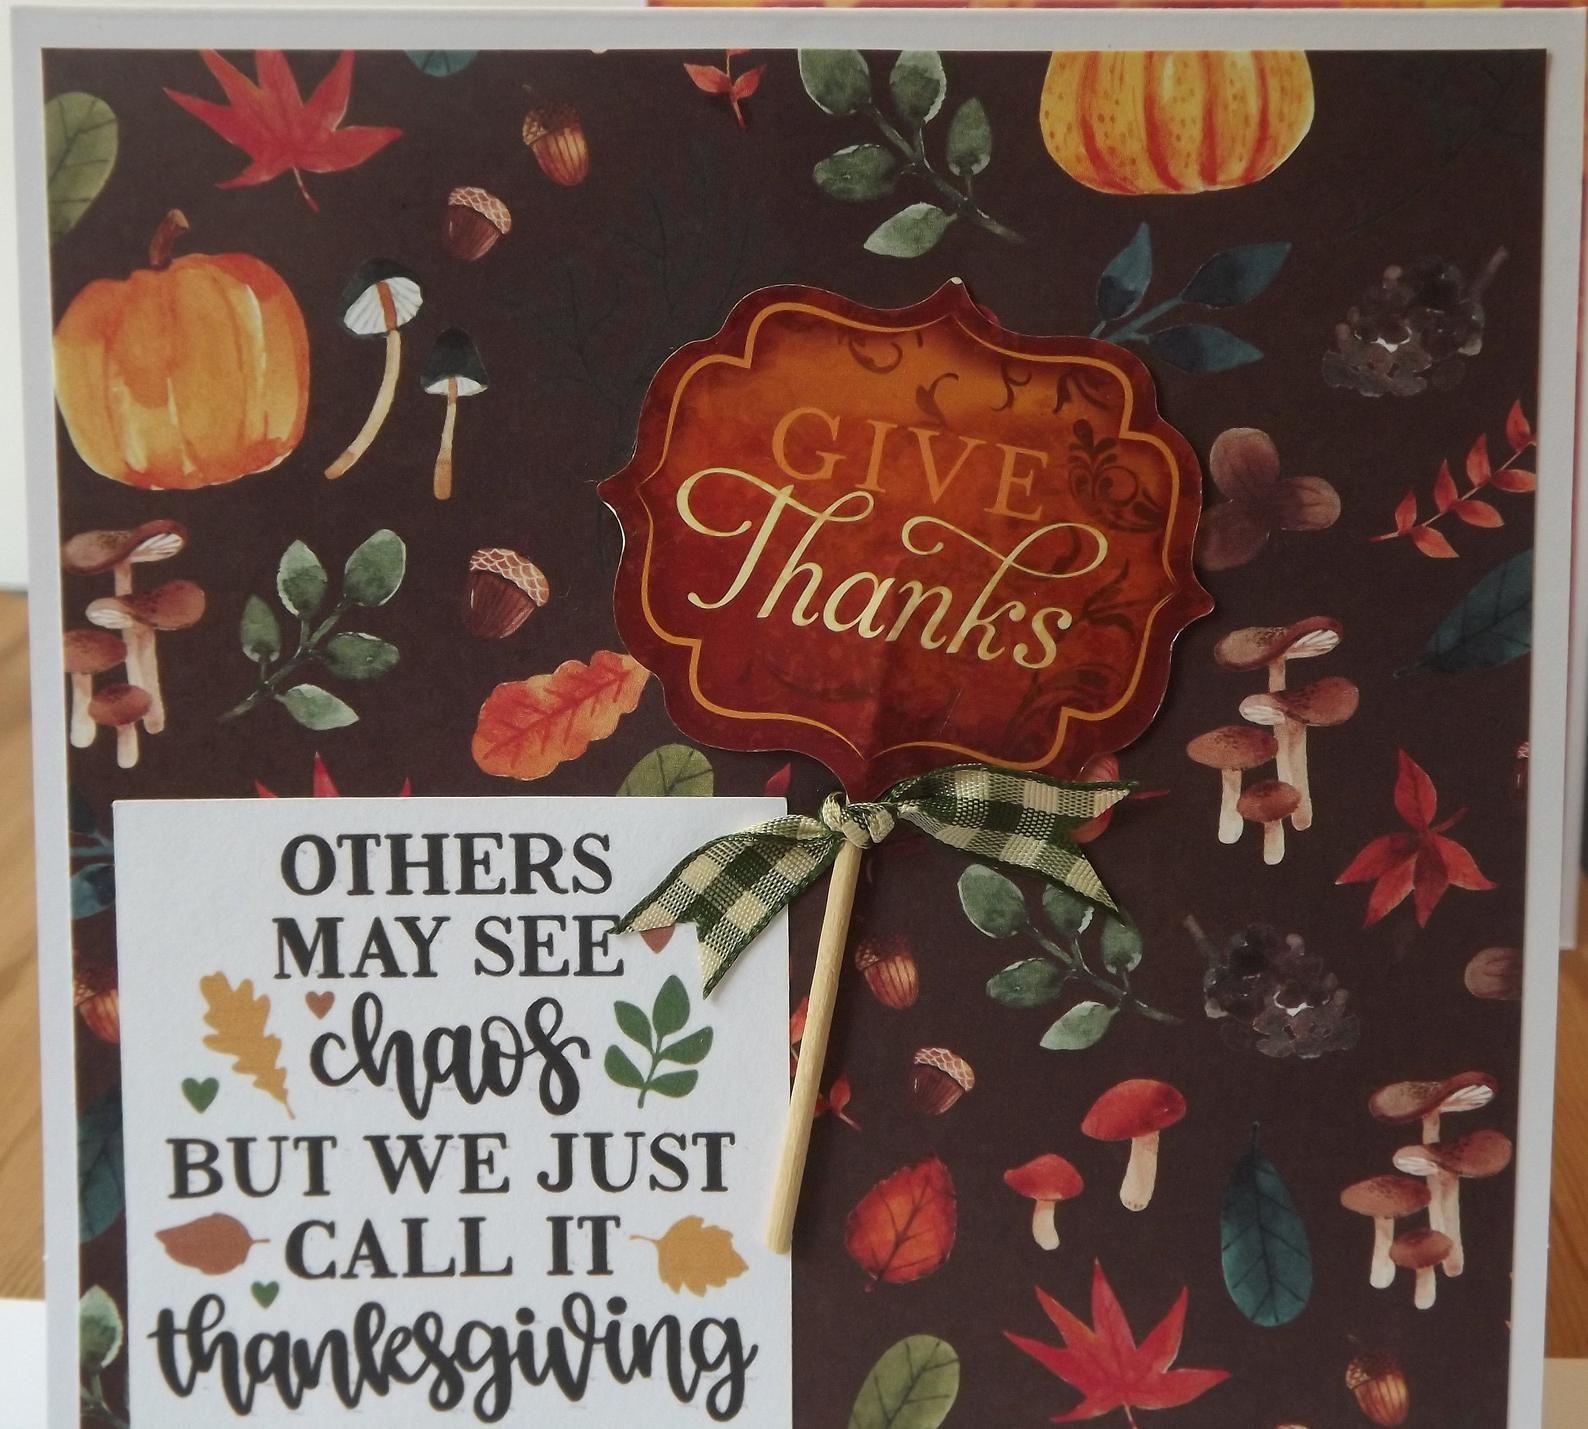 give thanks card chaos thanksgiving fun card  gracias